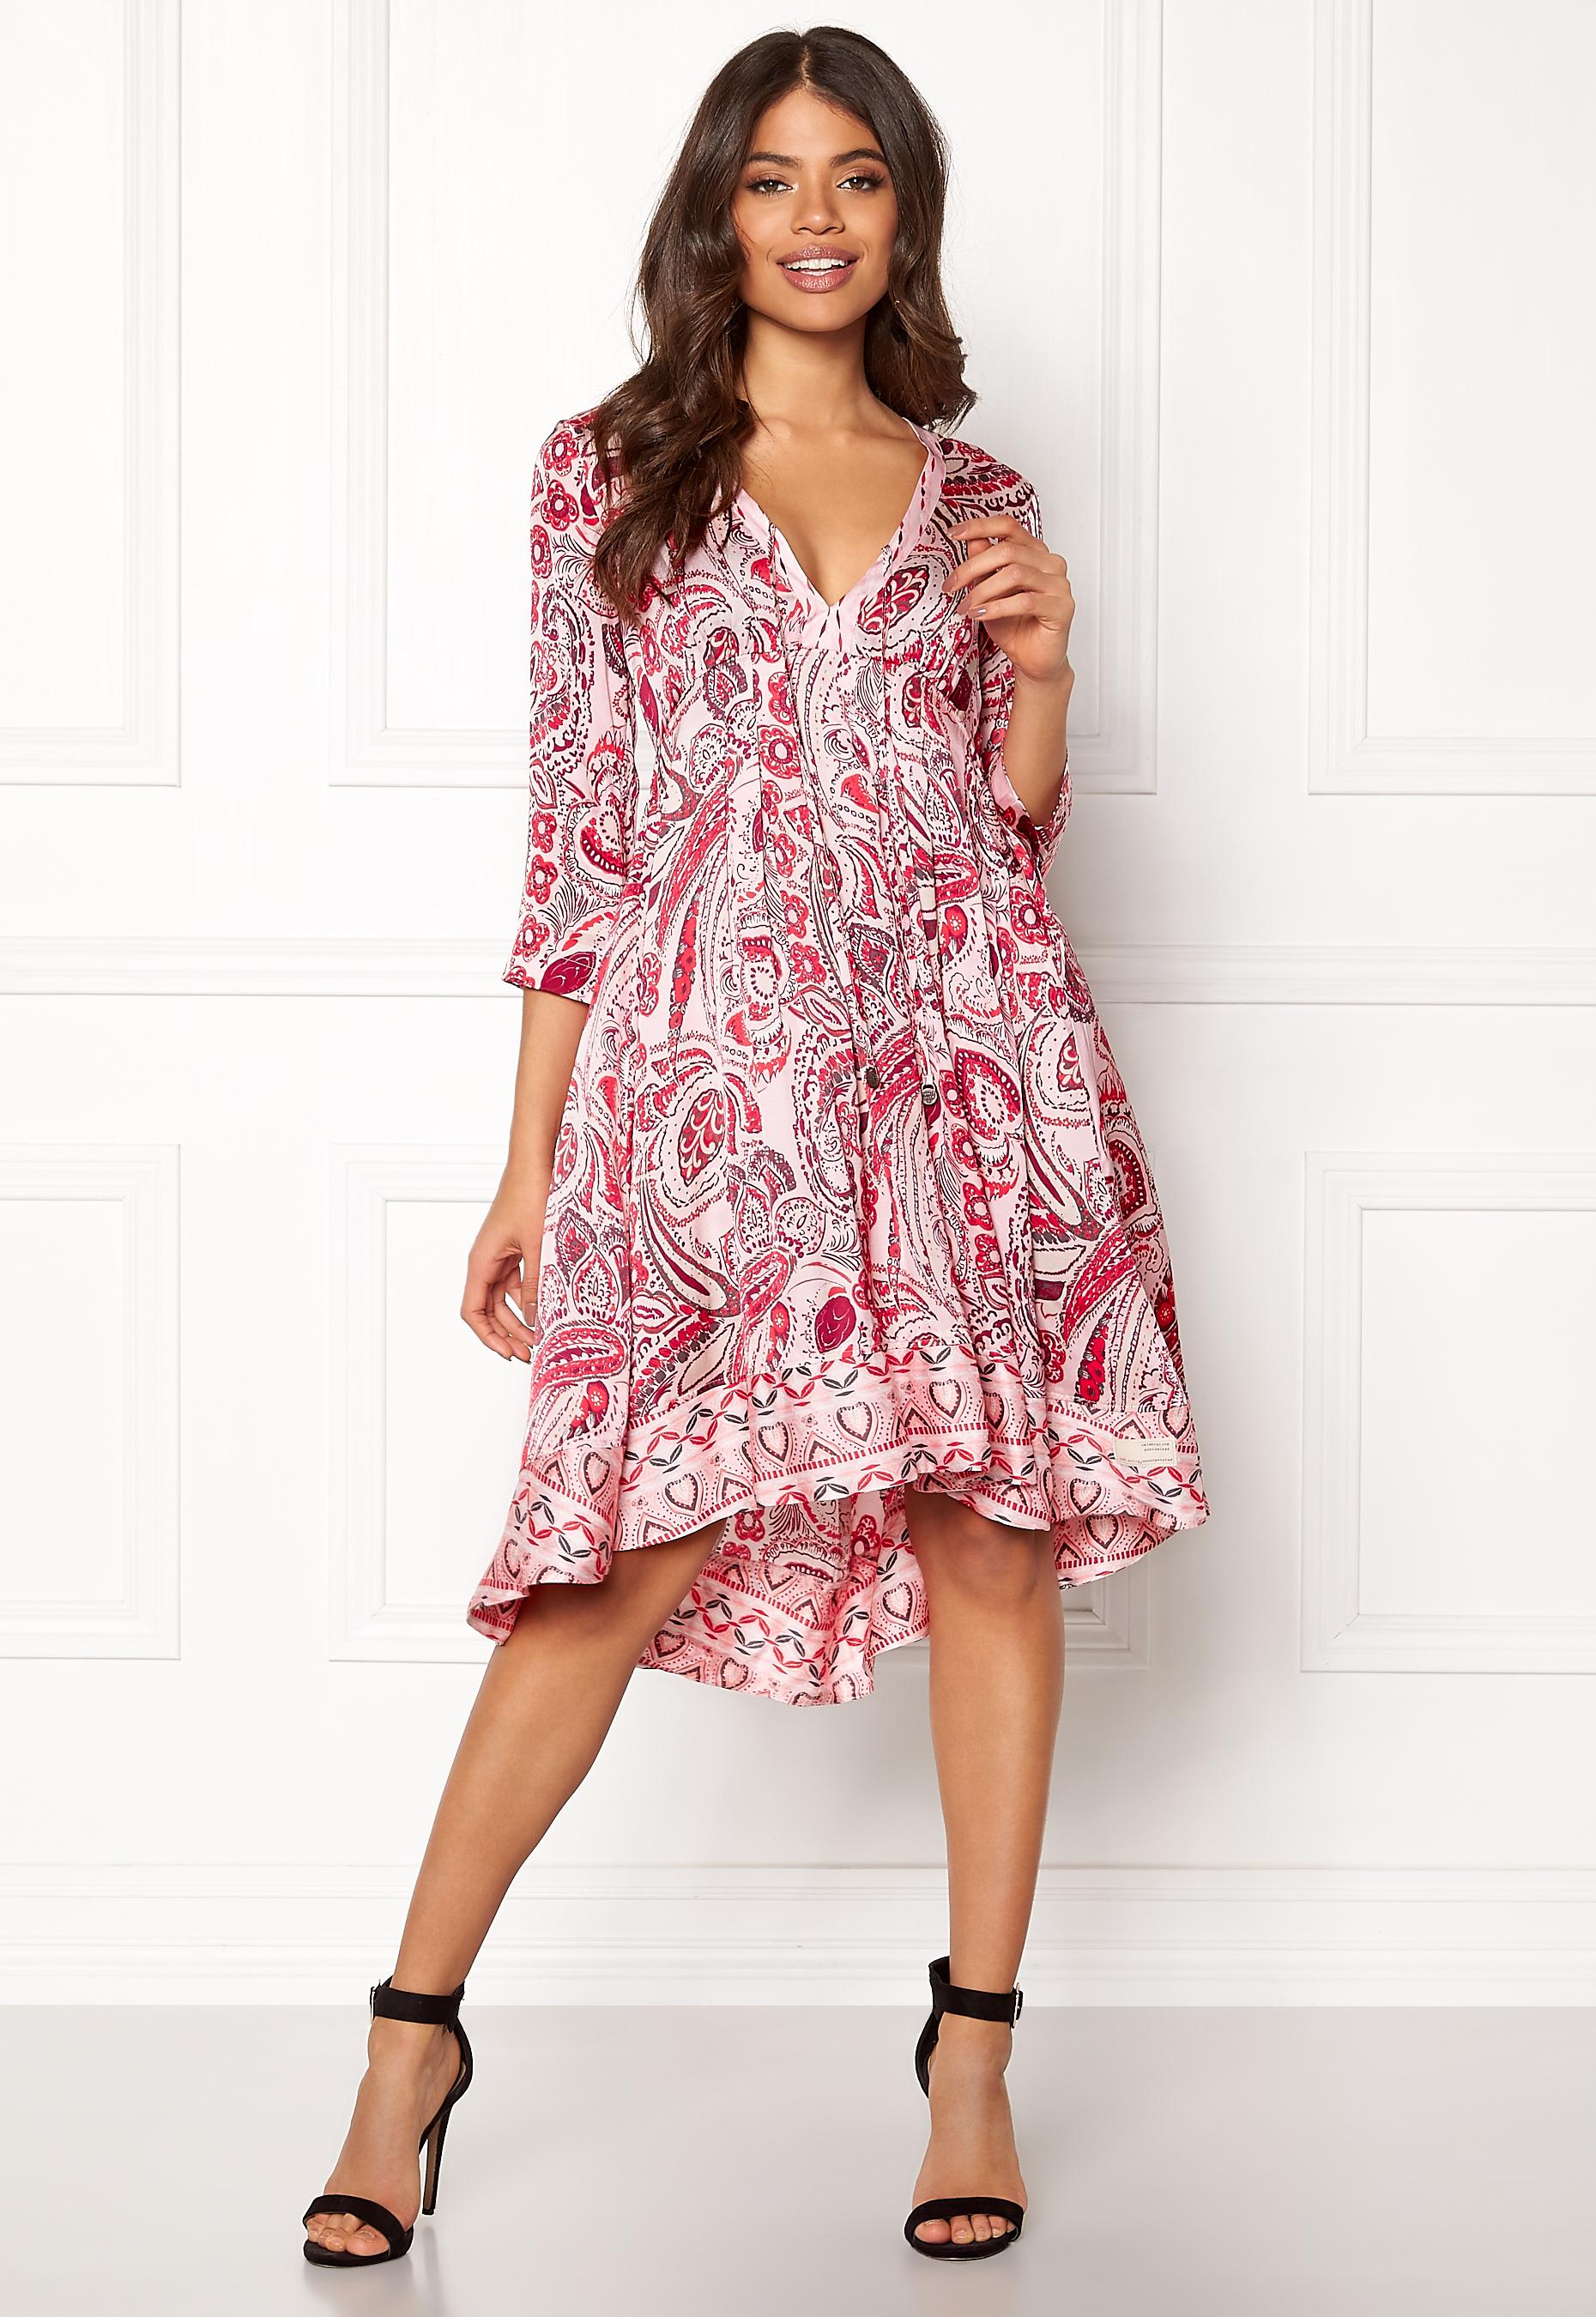 a5840d806697 Odd Molly Esemble Dress Soft Rose - Bubbleroom